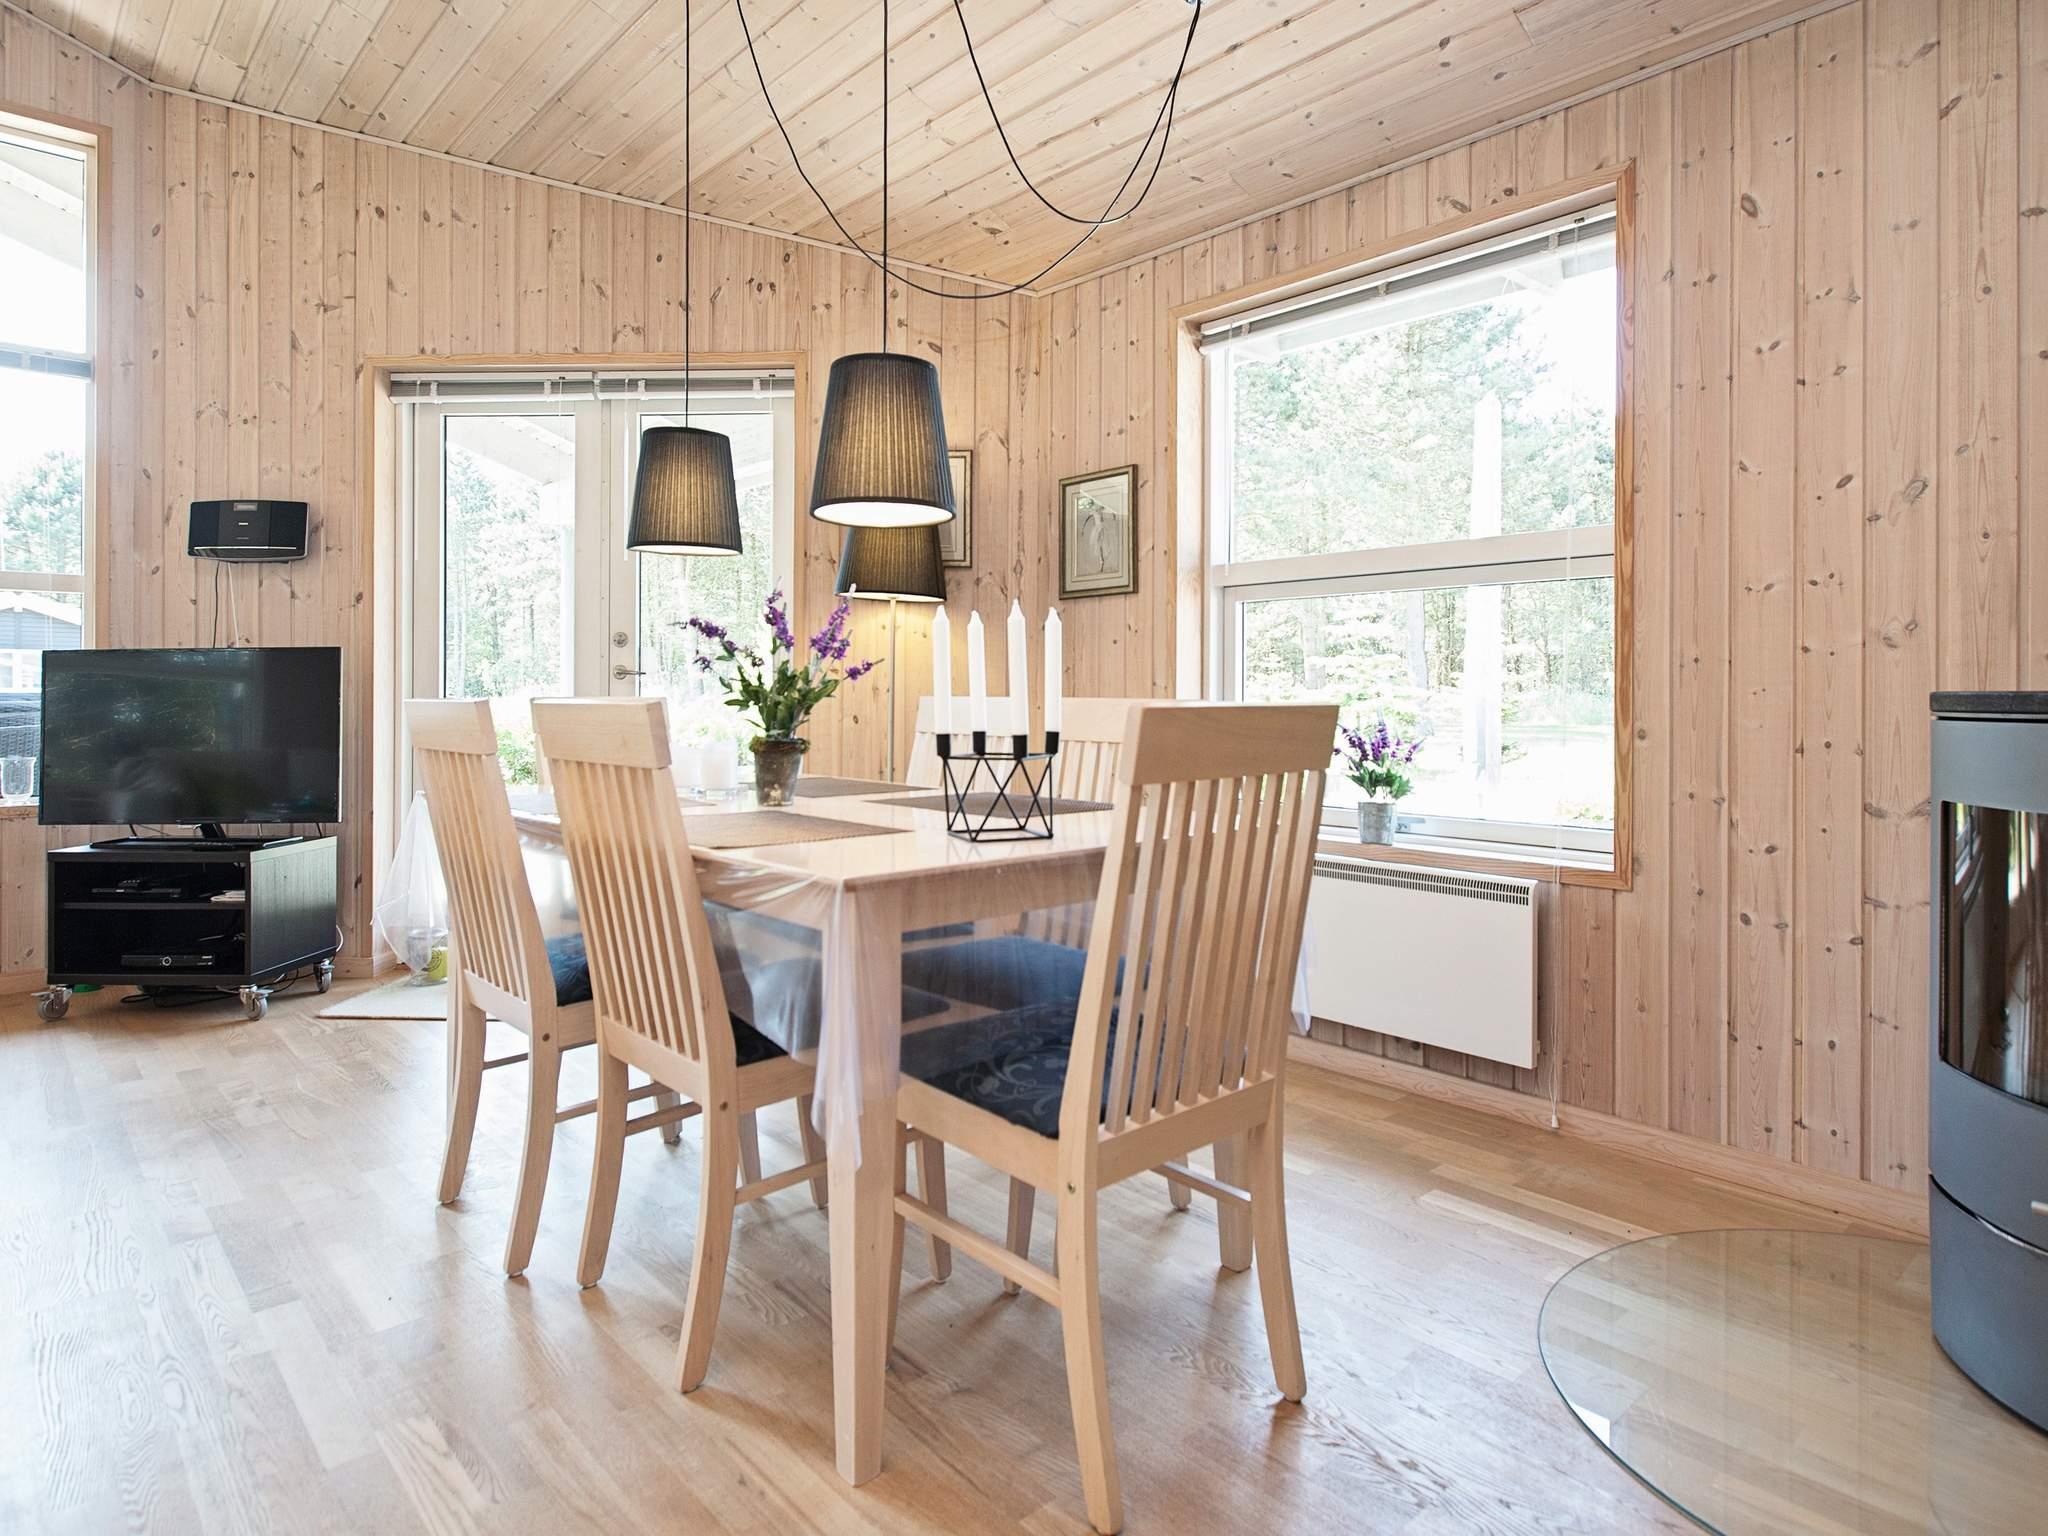 Ferienhaus Hyldtofte Østersøbad (93262), Hyldtofte Fæland, , Lolland, Dänemark, Bild 4